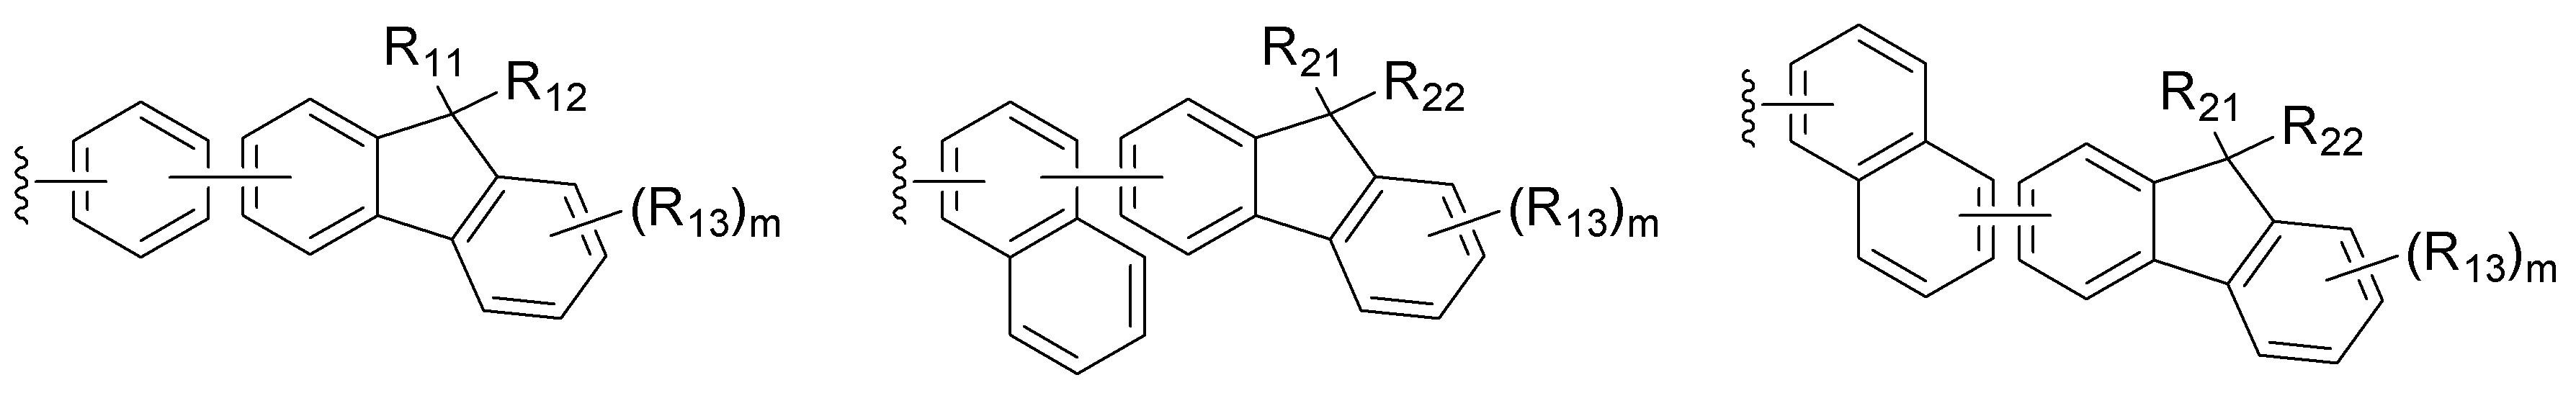 Figure 712009006163353-pat00674